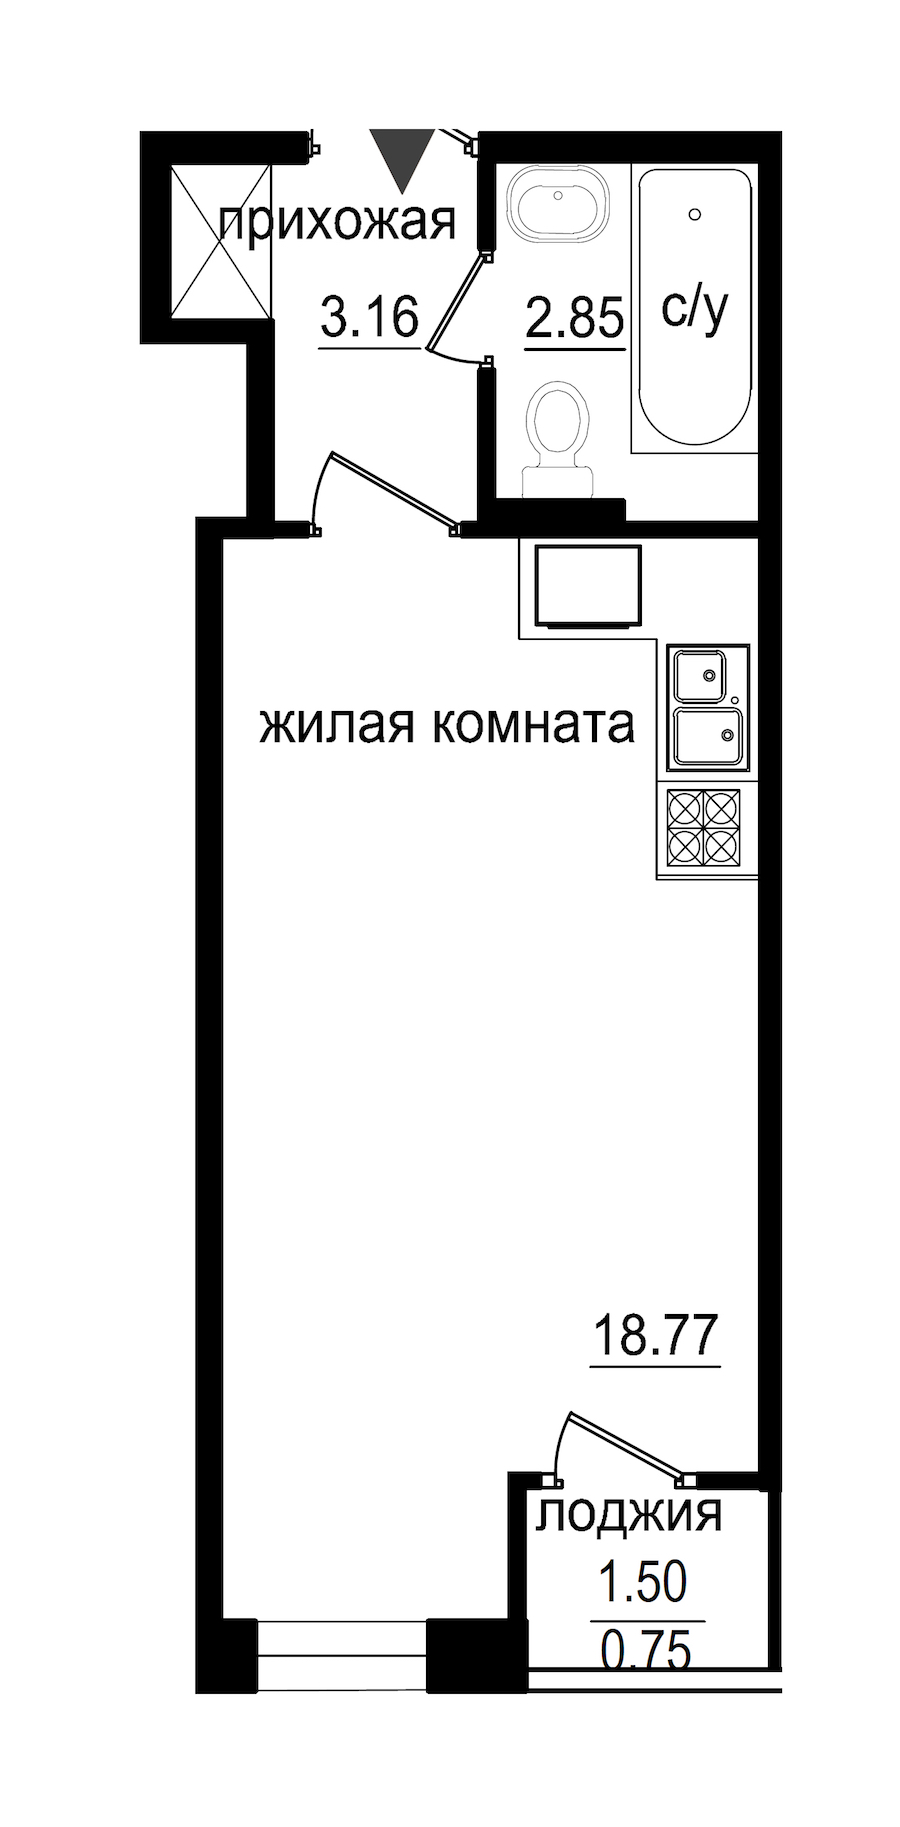 Студия 25 м<sup>2</sup> на 1 этаже